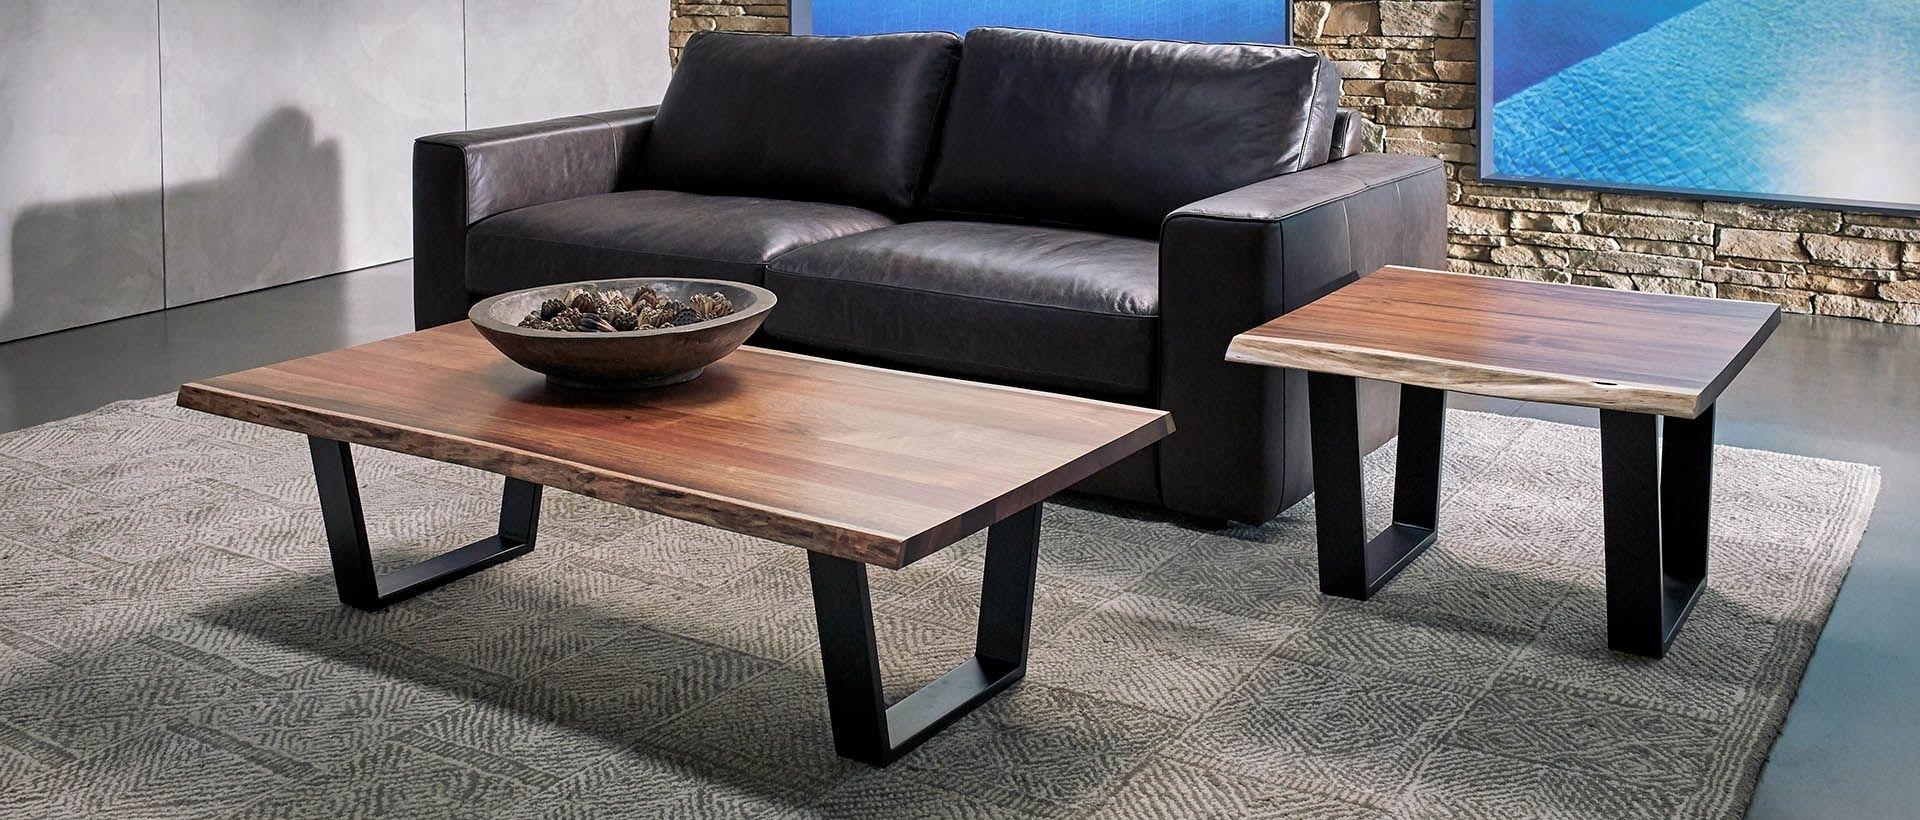 Nick Scali | Coffee & Lamp Tables | Nick Scali Furniture Inside Joni Brass And Wood Coffee Tables (Photo 28 of 30)